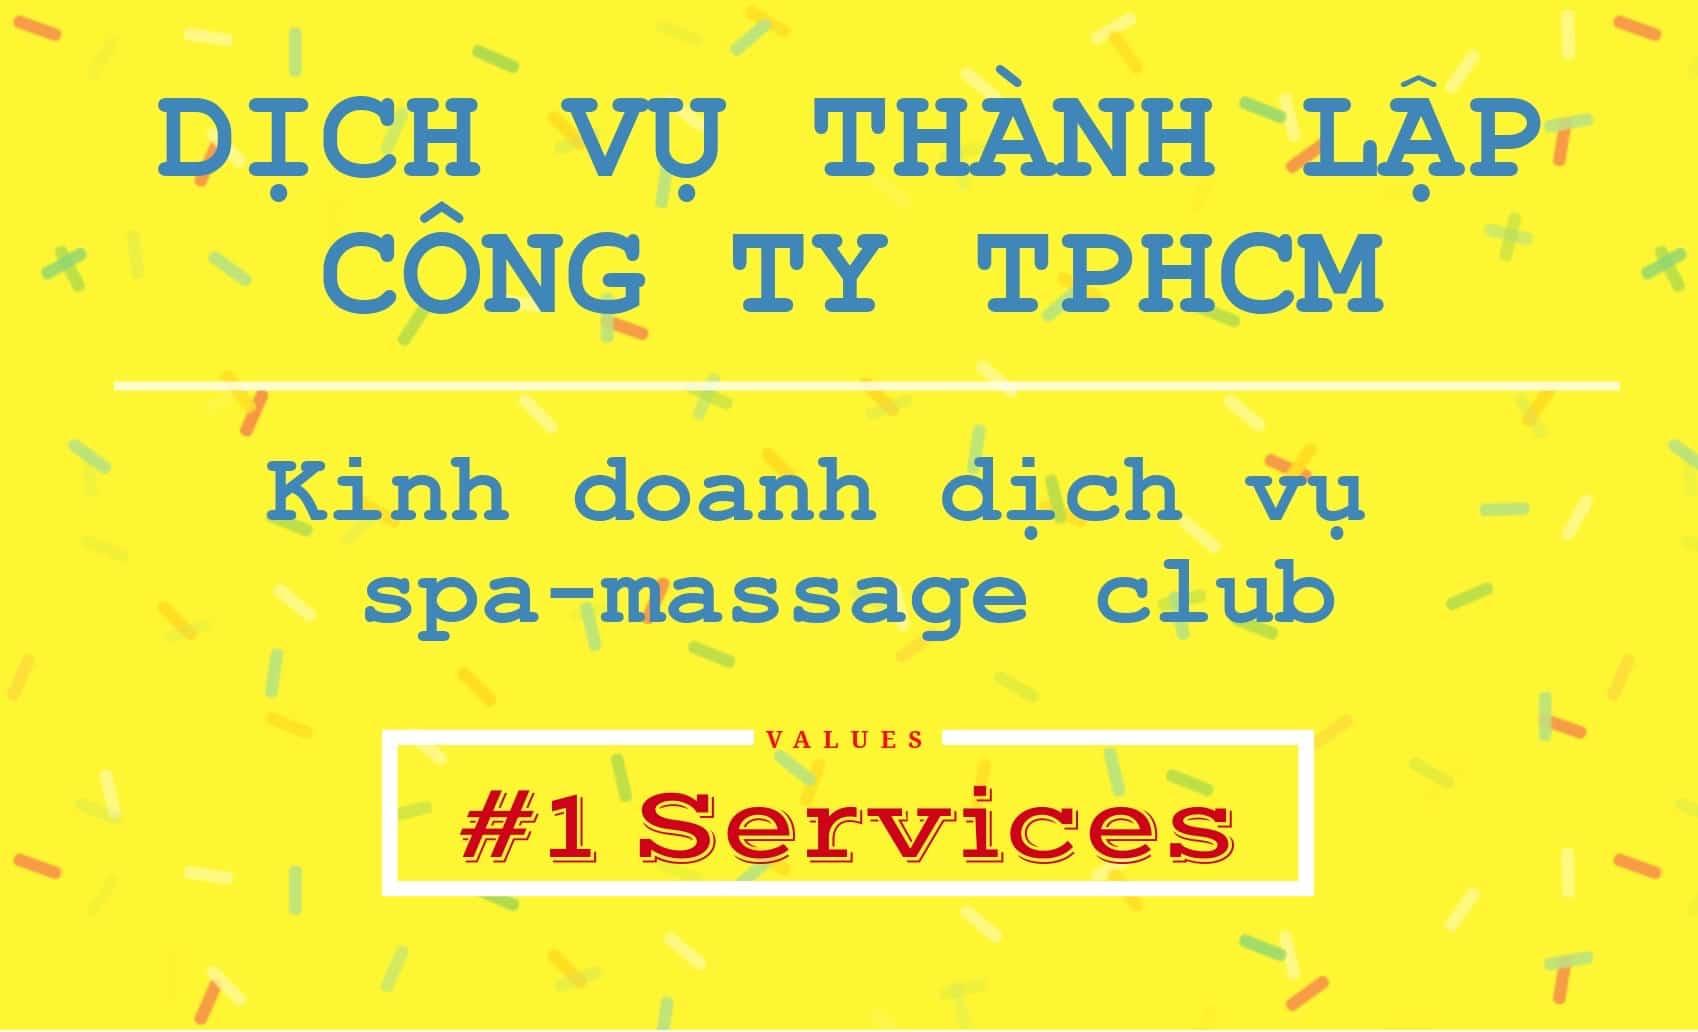 kinh doanh dịch vụ spa, massage